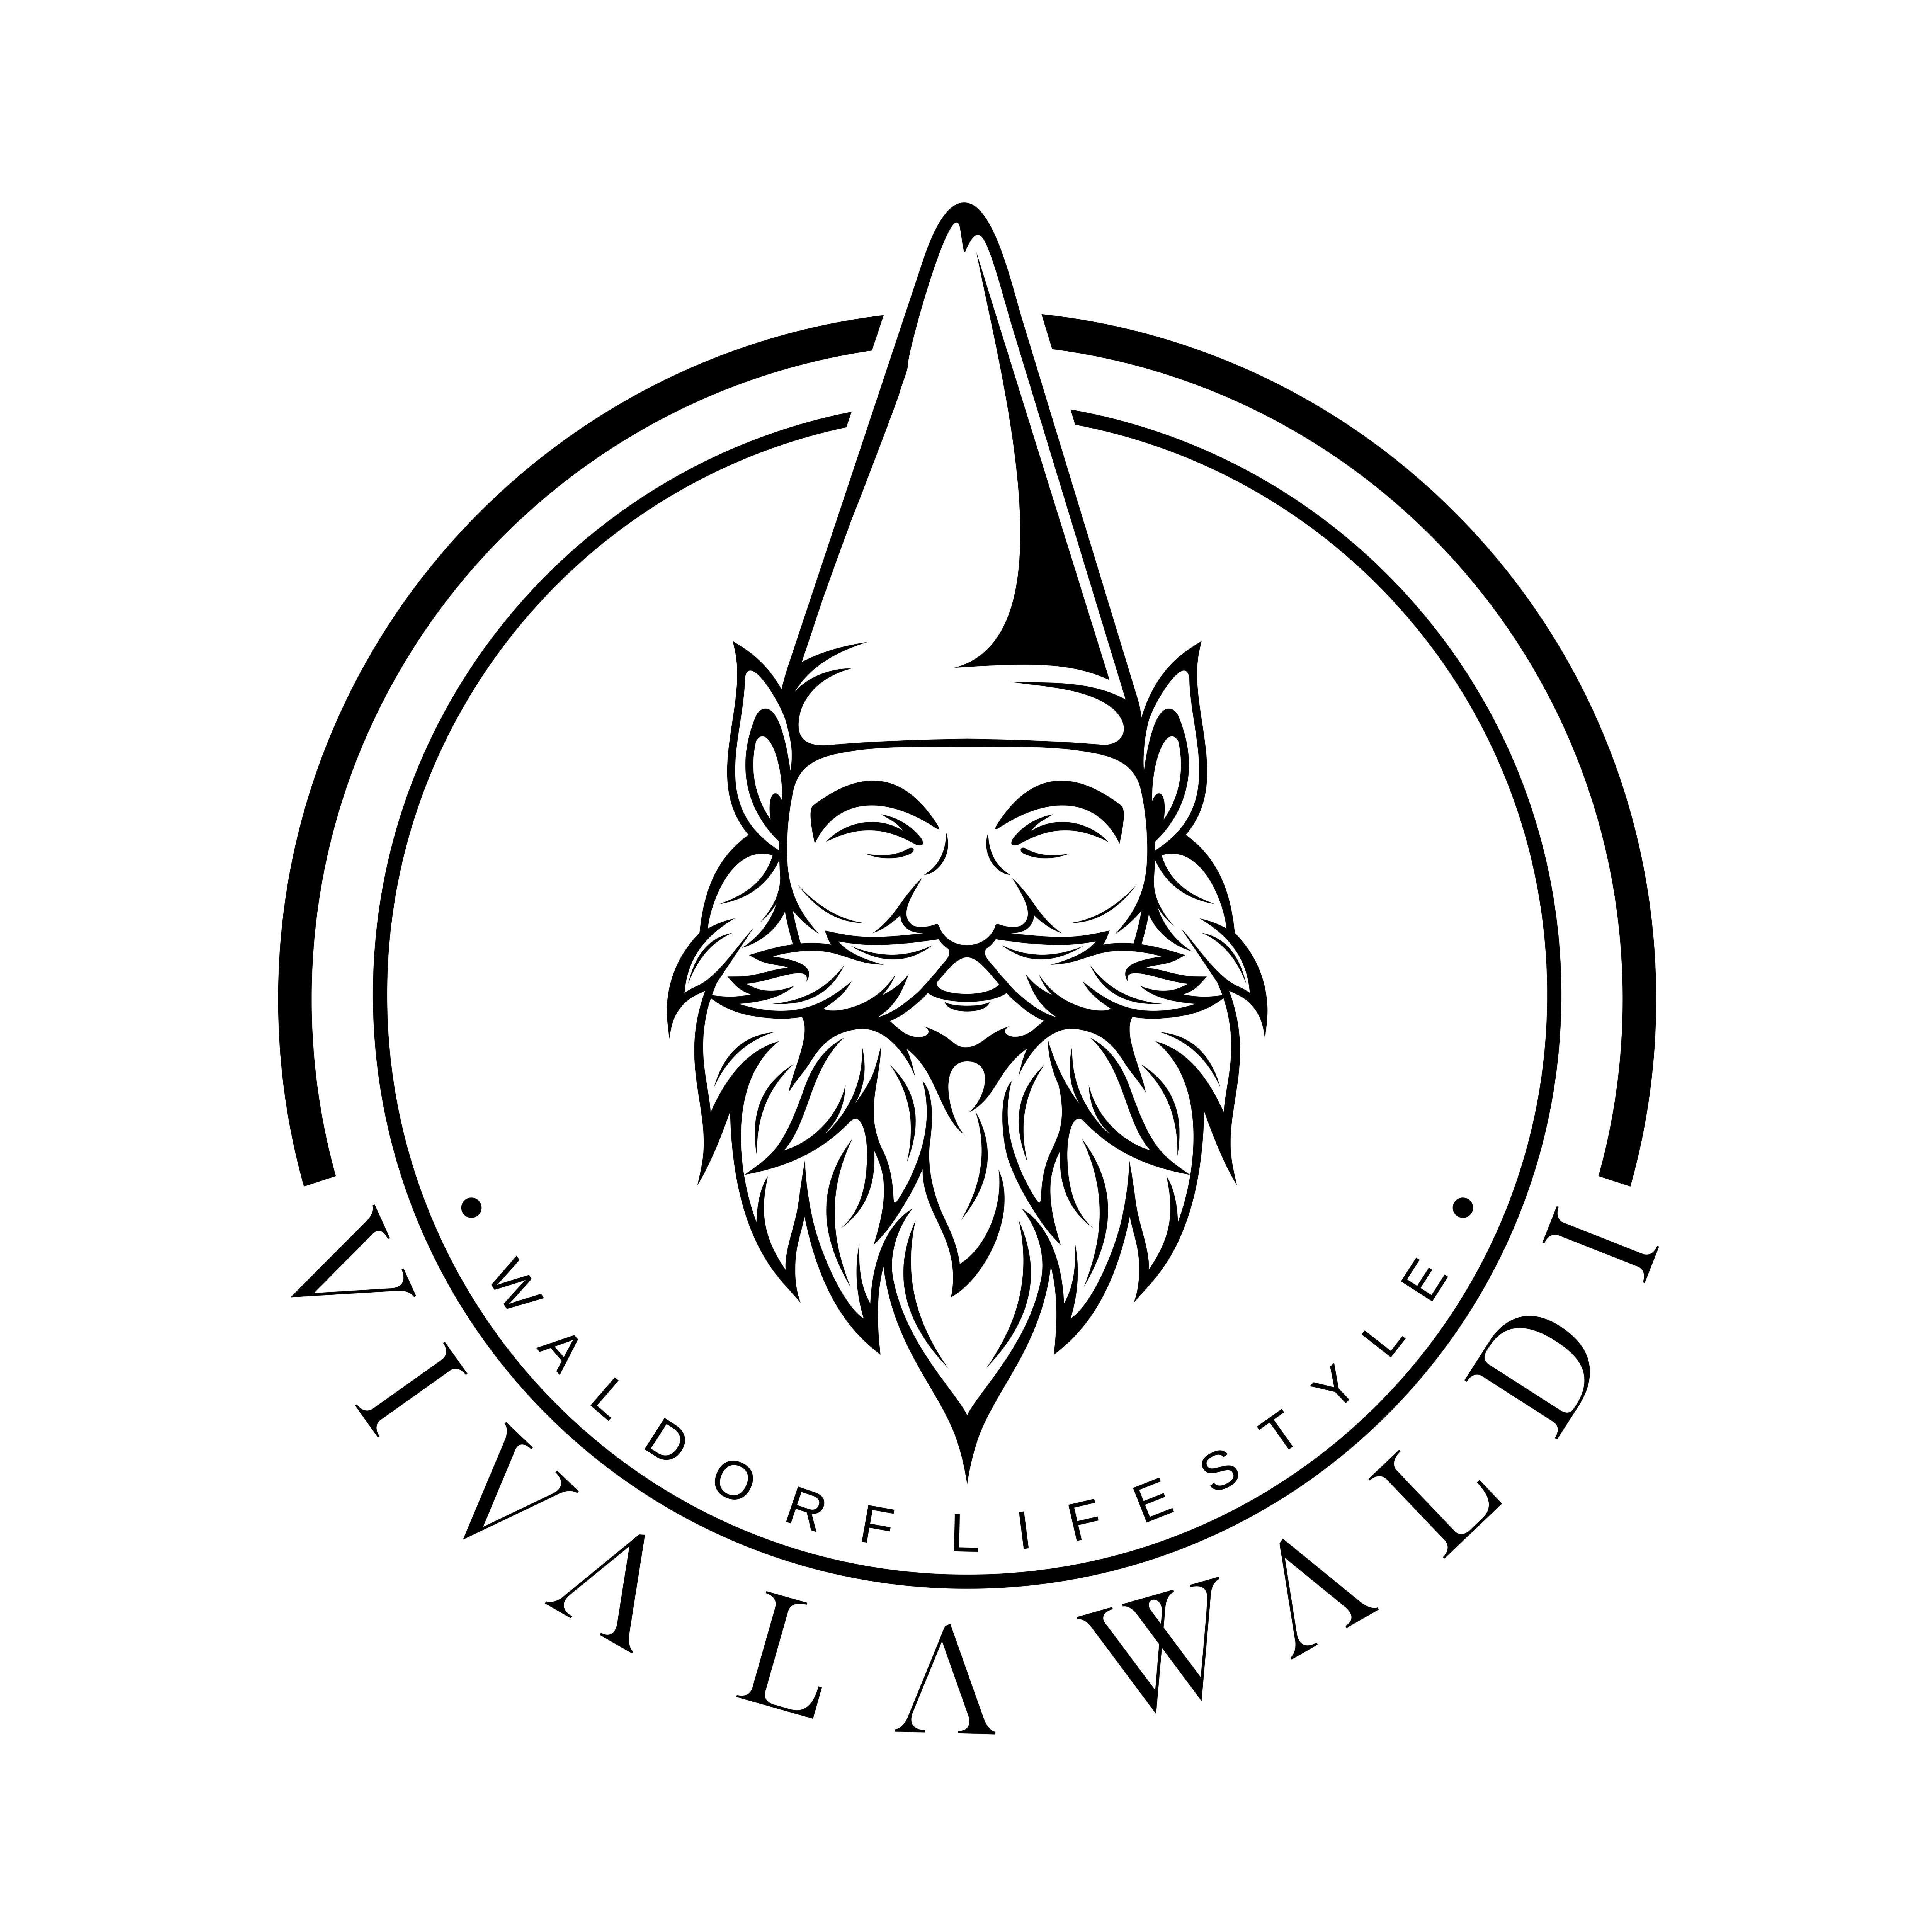 Create a beautiful gnome logo for a fashion brand